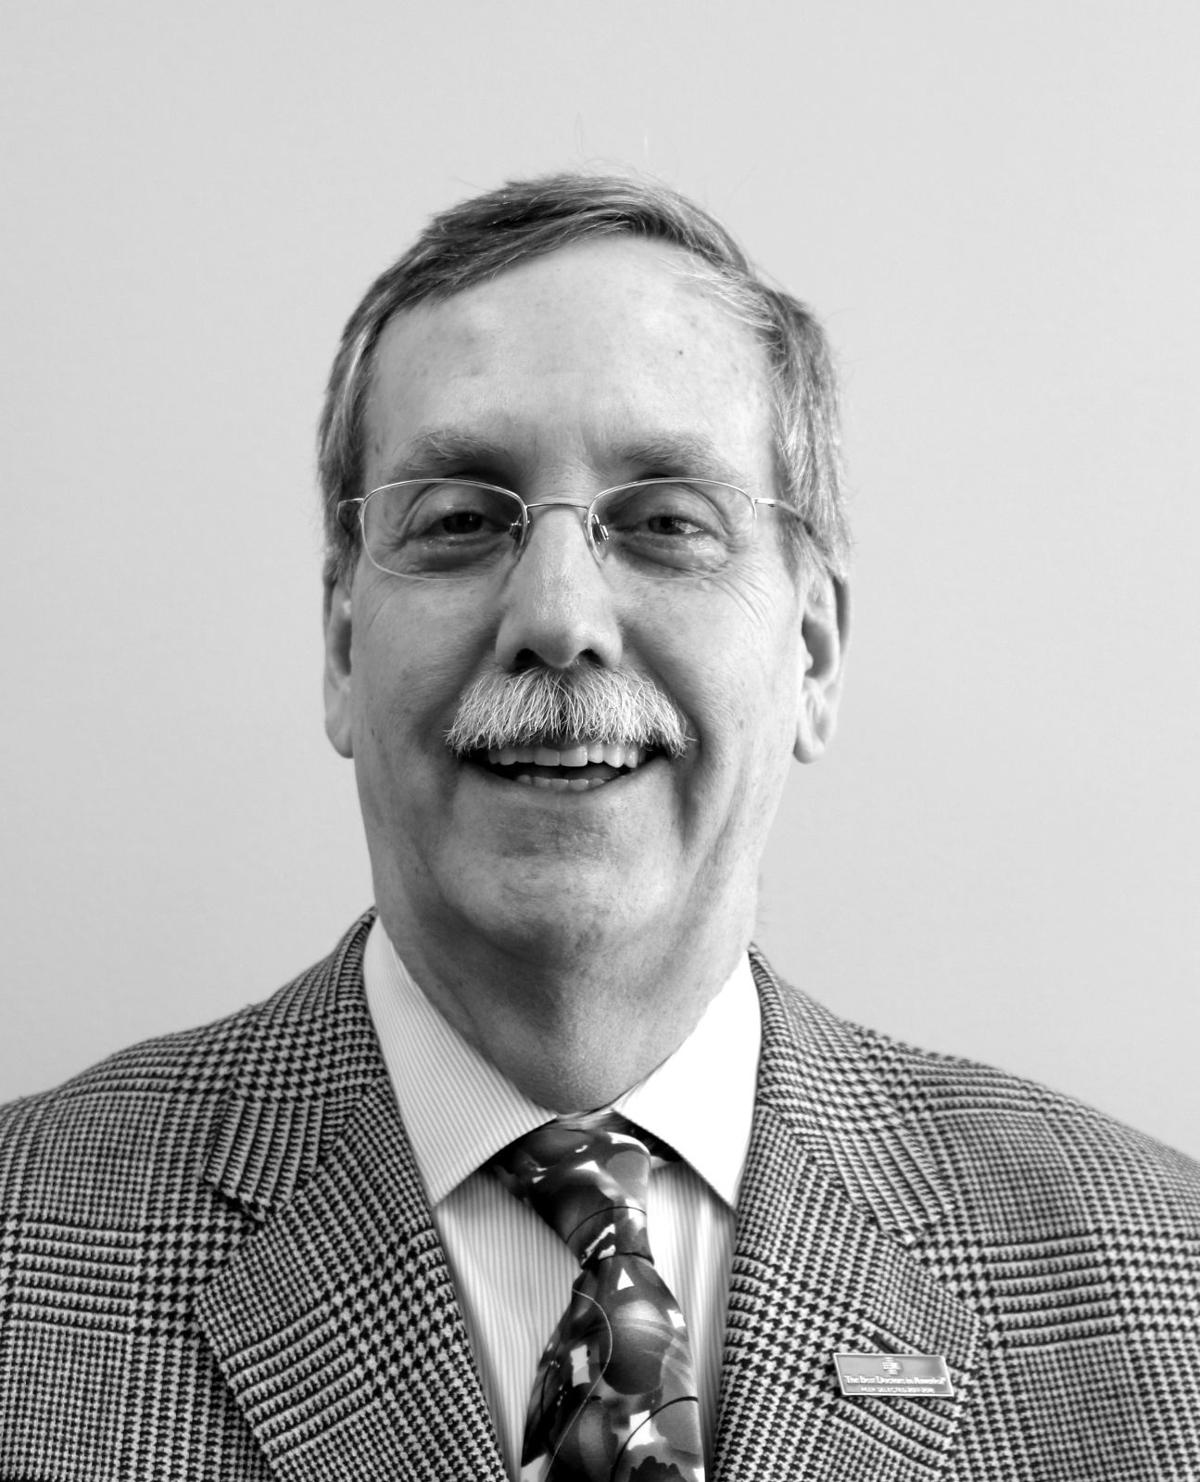 O'Grady, Joseph Jr., M.D.